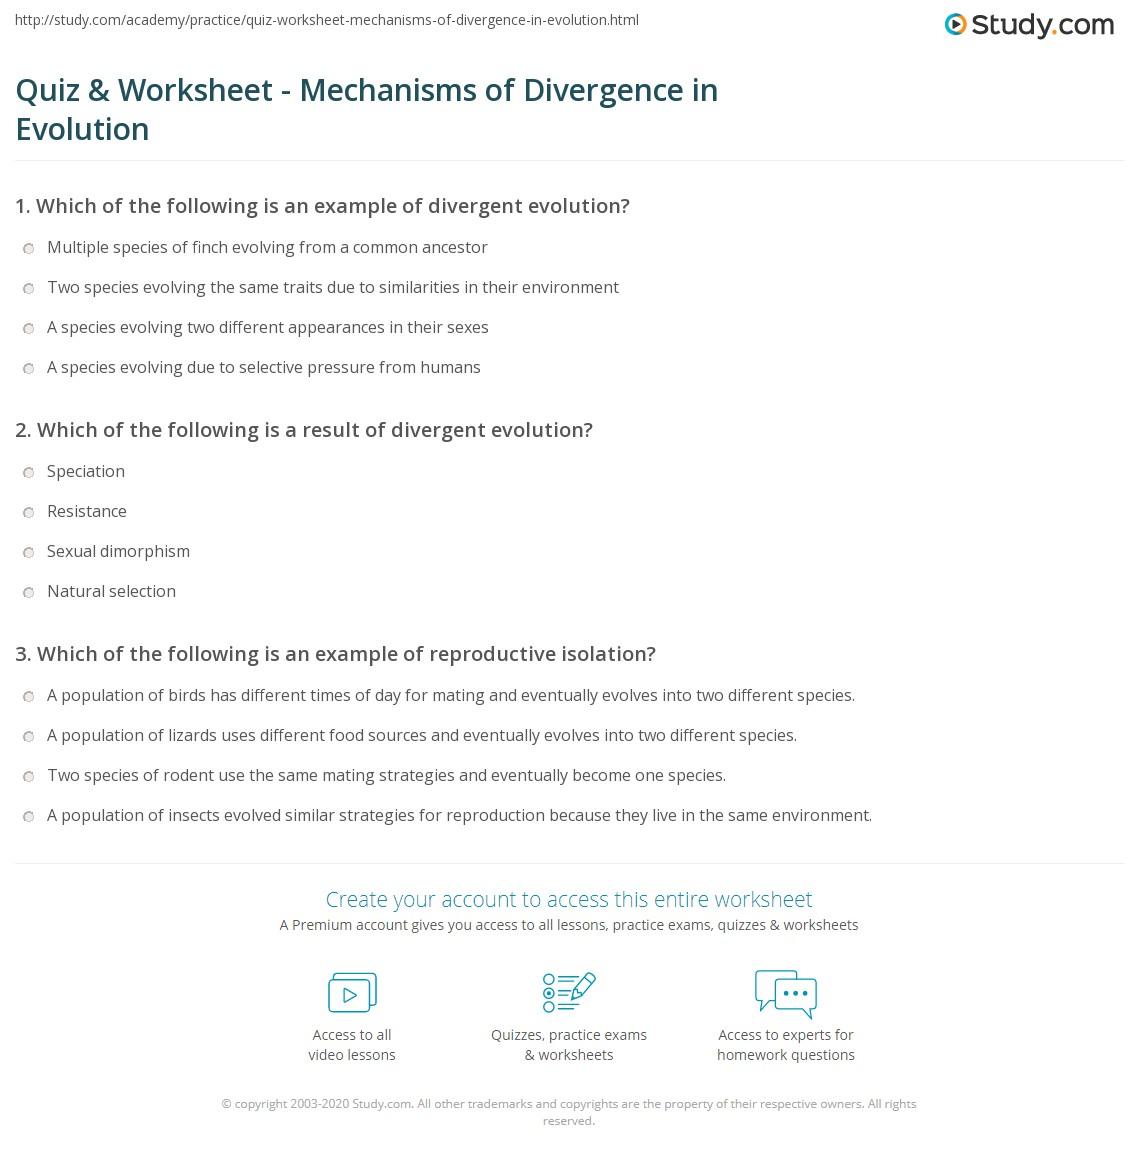 Quiz Worksheet Mechanisms Of Divergence In Evolution Study